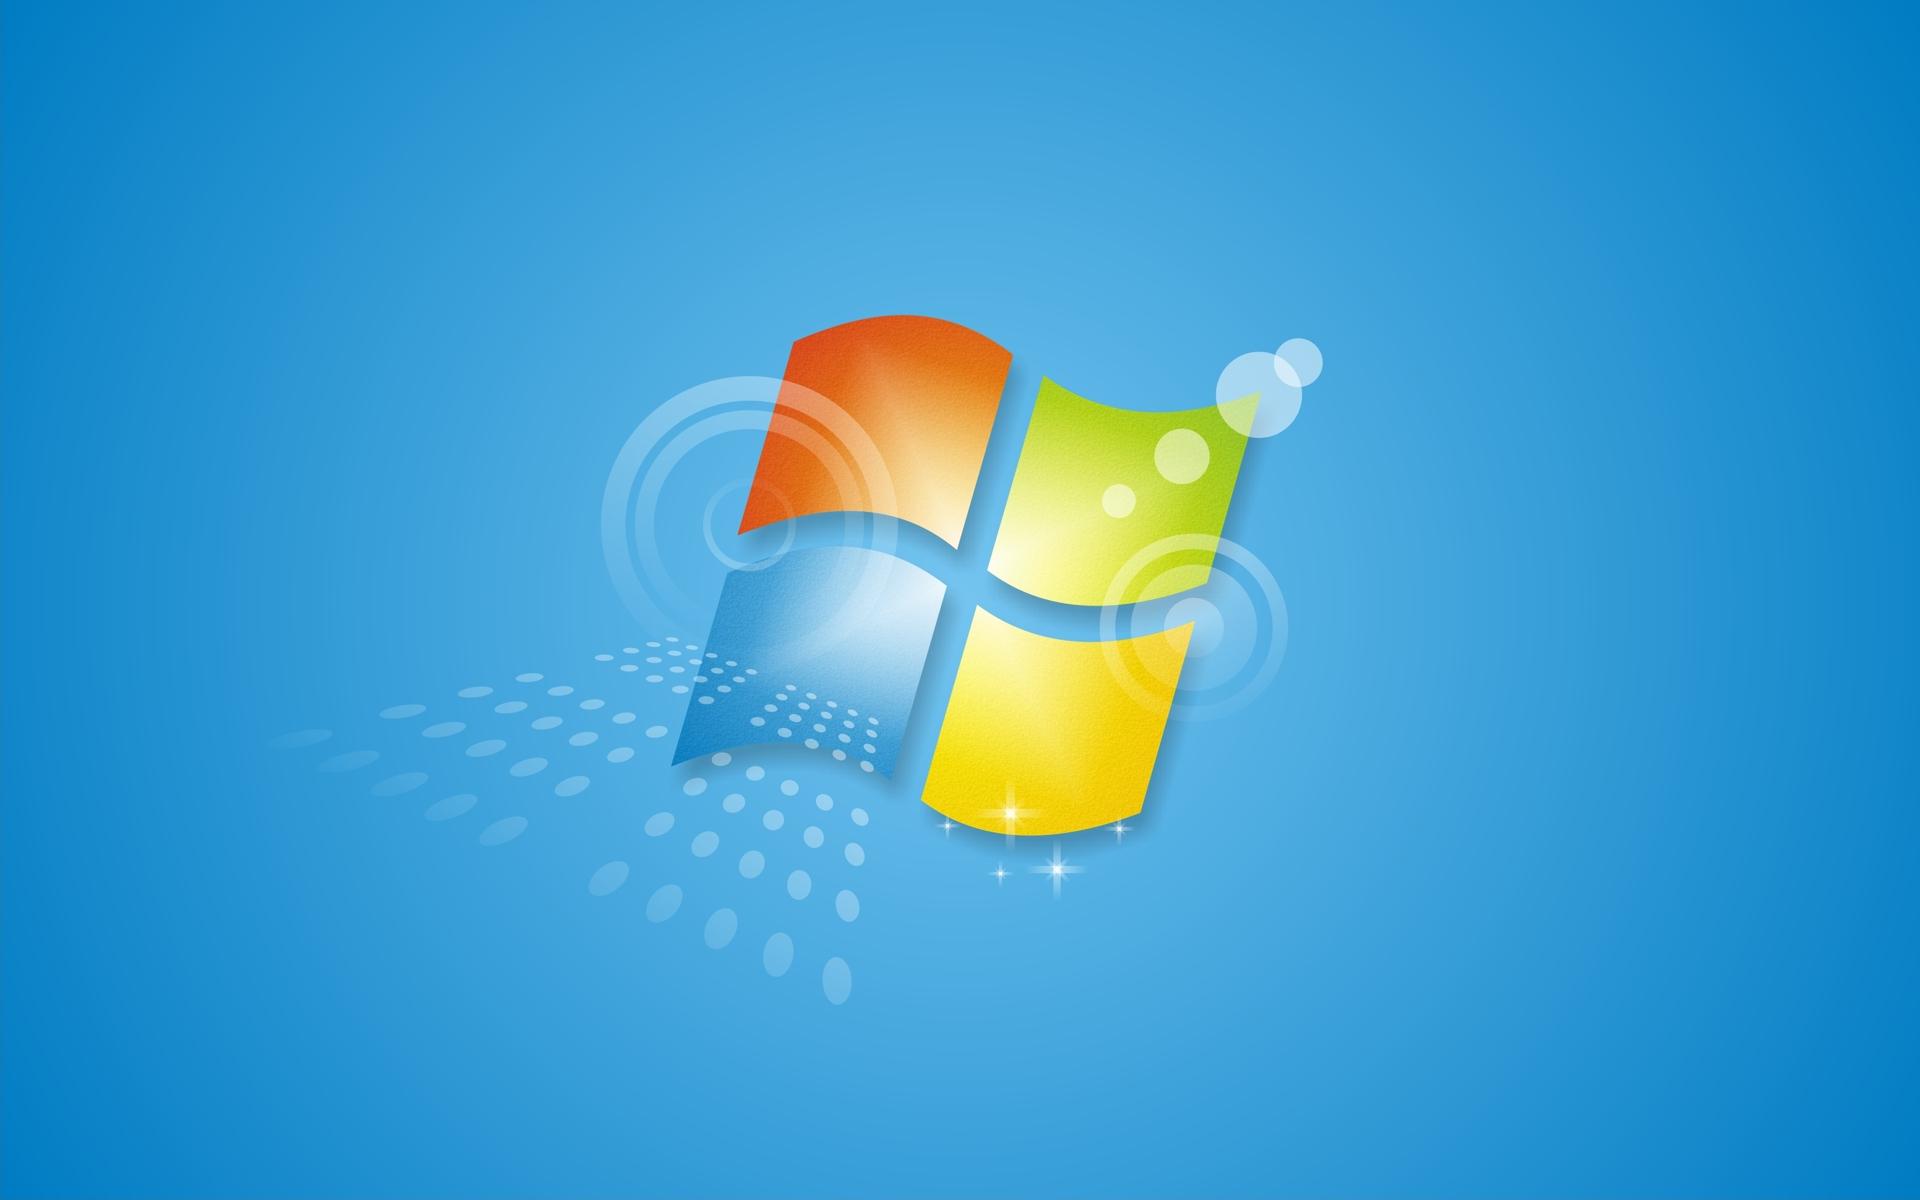 Technology Management Image: Windows 7 Professional Wallpaper HD